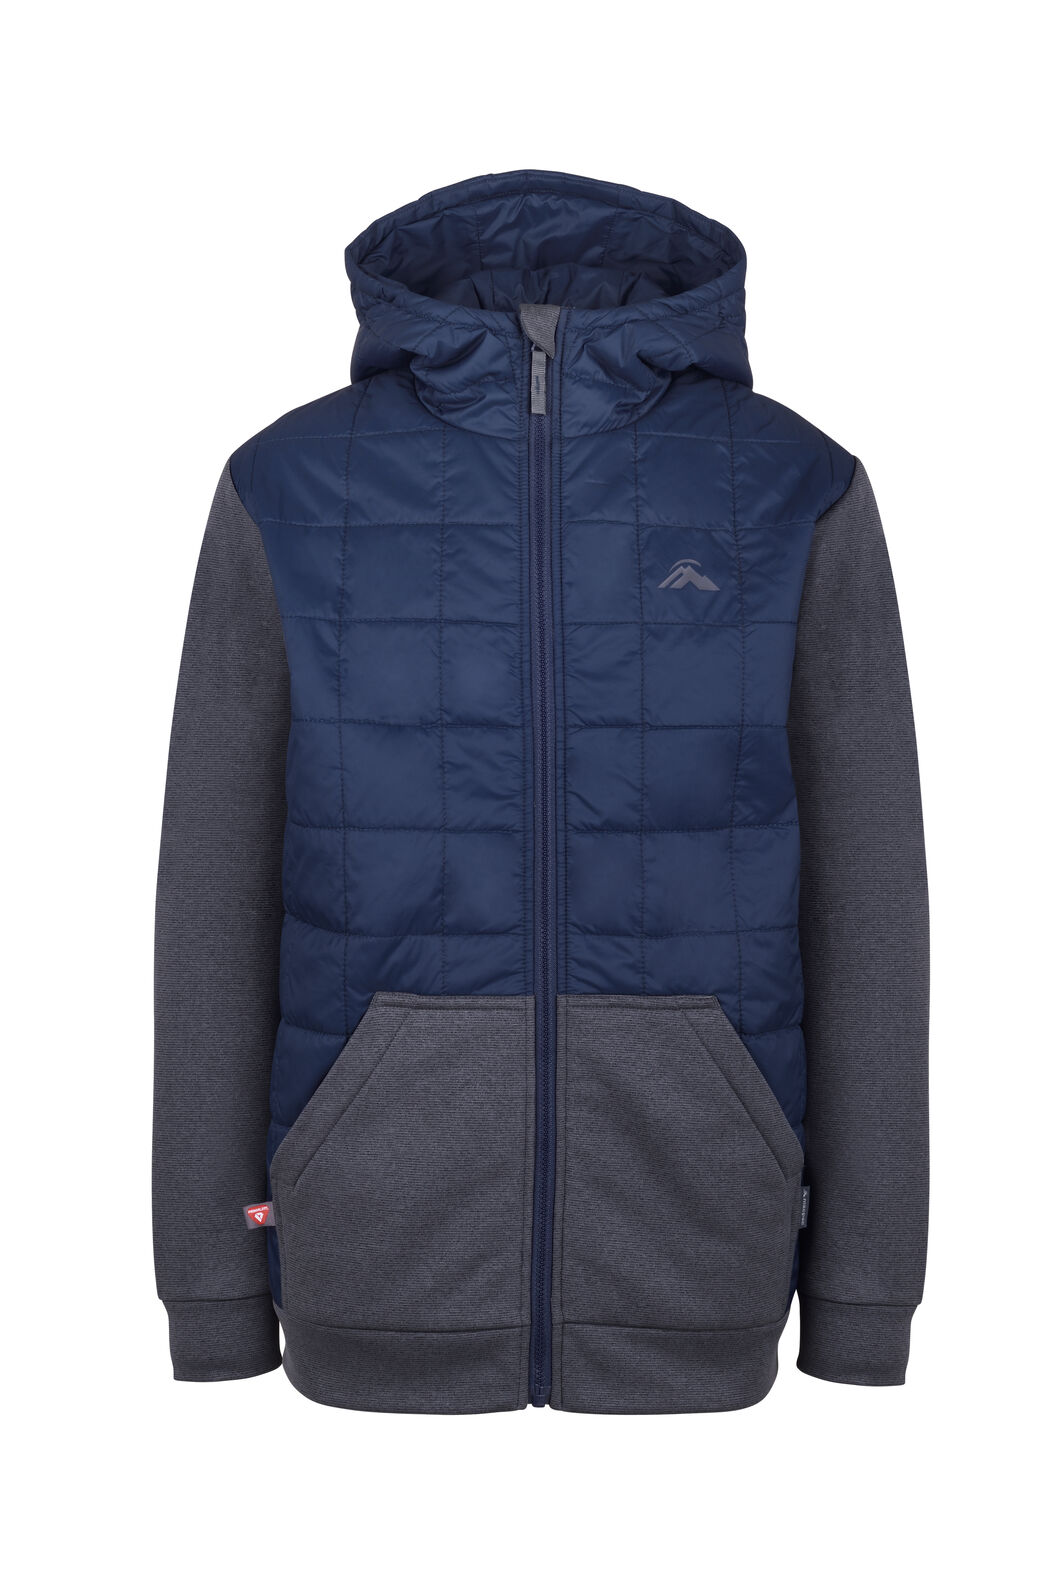 Macpac Campfire PrimaLoft® Hybrid Jacket - Kids', Black Iris/Asphalt, hi-res